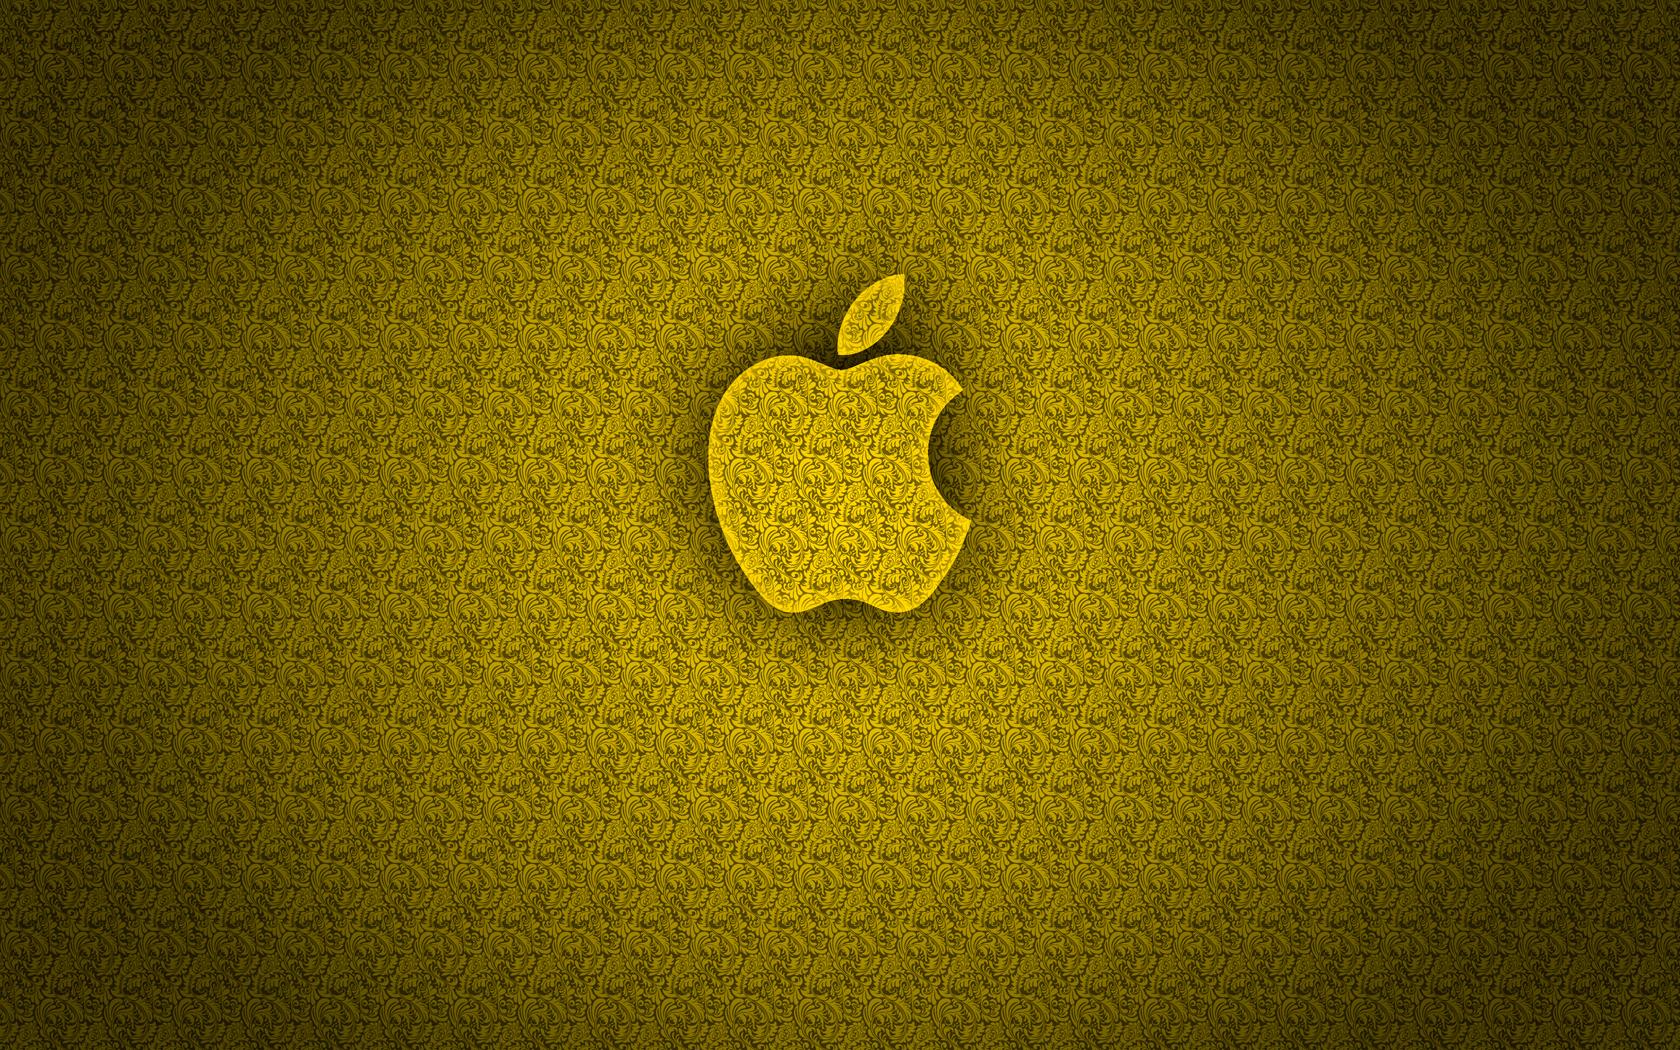 1680x1050px Gold Apple Wallpaper Wallpapersafari